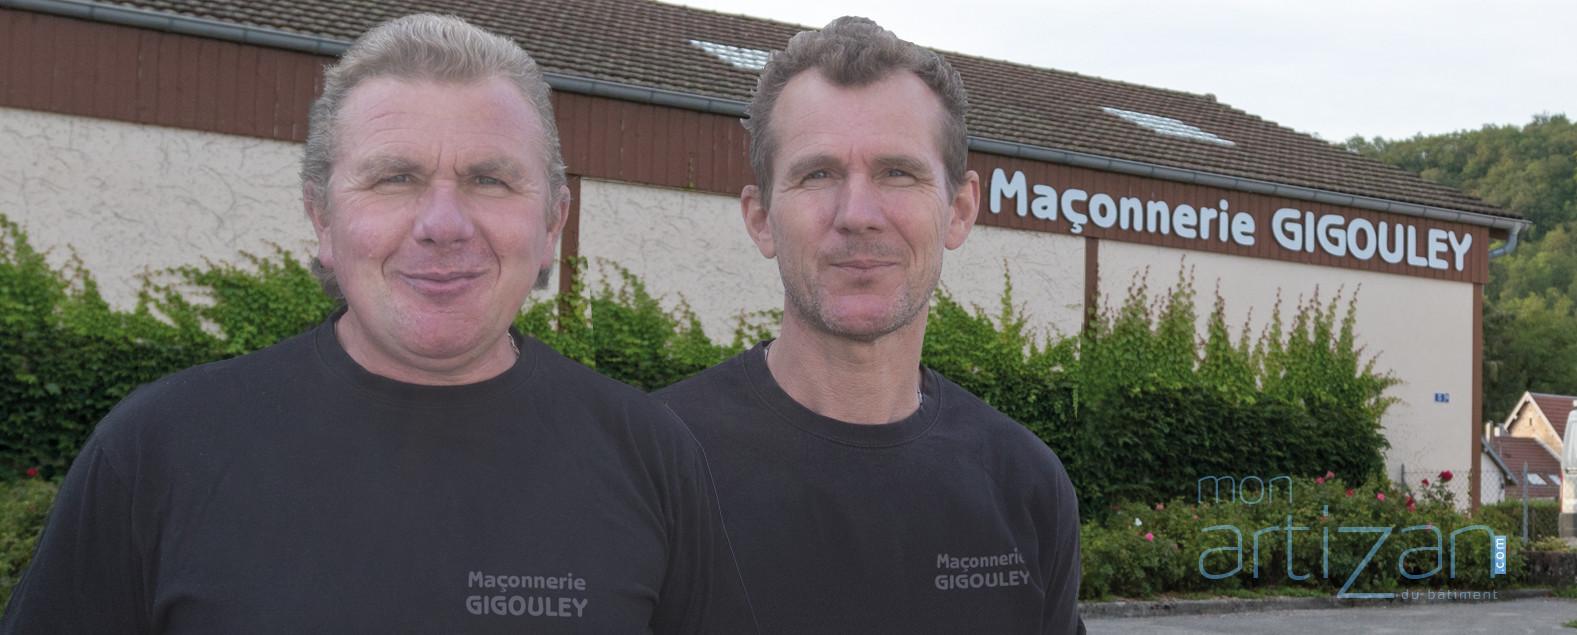 Maçonnerie Gigouley, Christian et Régis dits «Les Gigous»